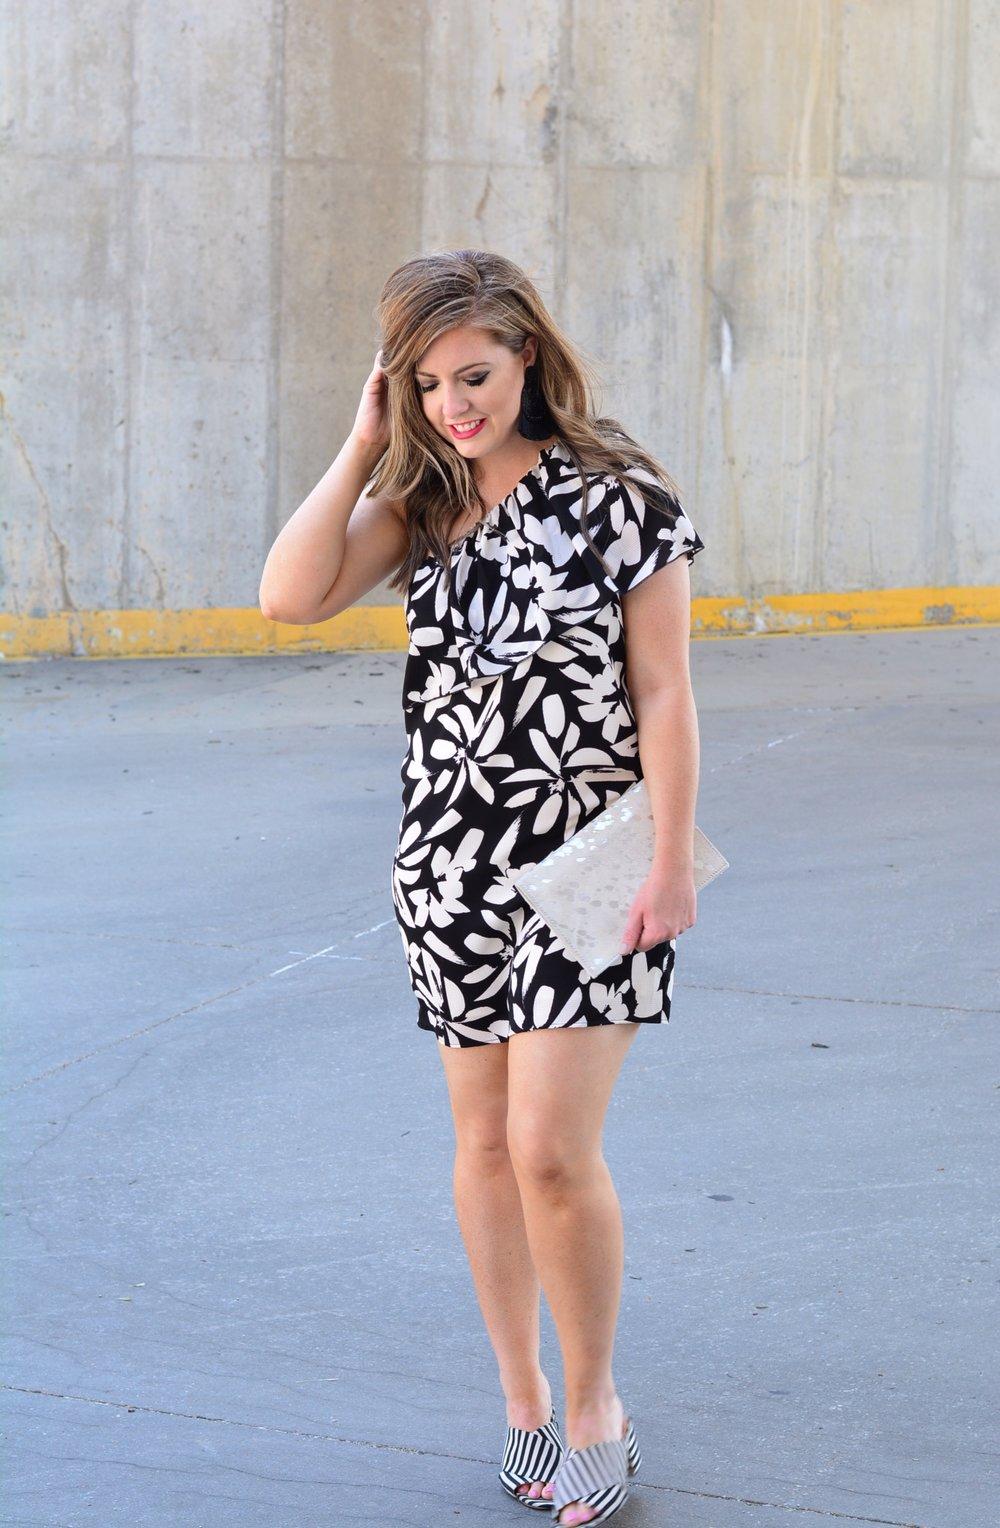 Black and white floral one shoulder dress